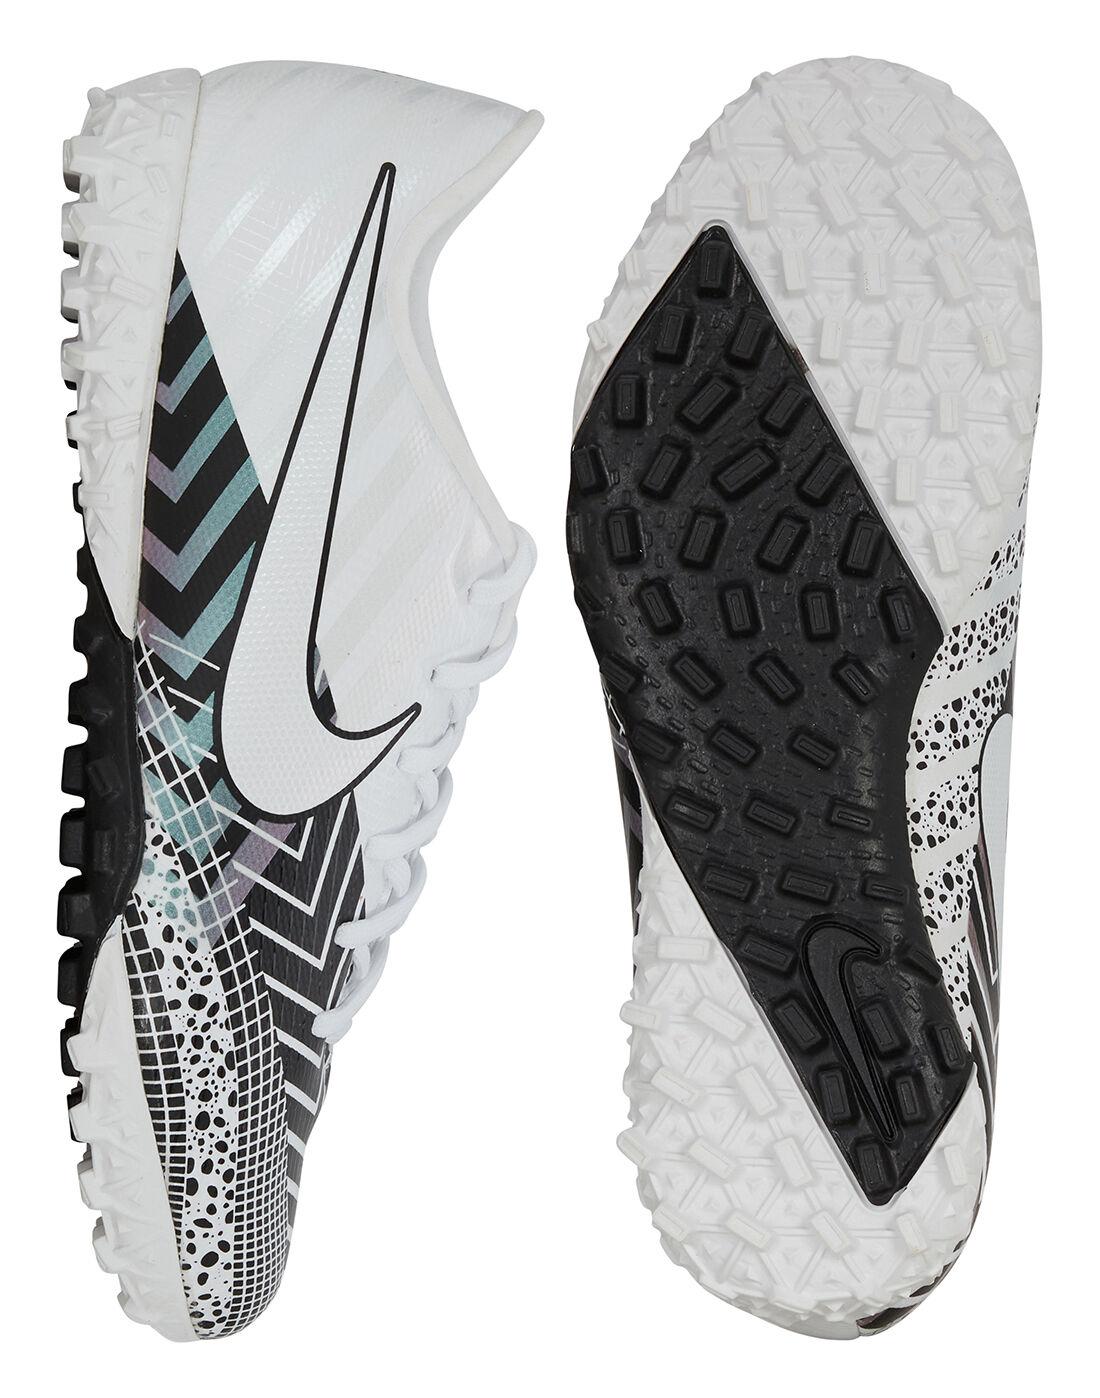 Nike rhinestone adidas tracksuit shoes for women | Kids Mercurial Vapor 13 Academy Astro Turf